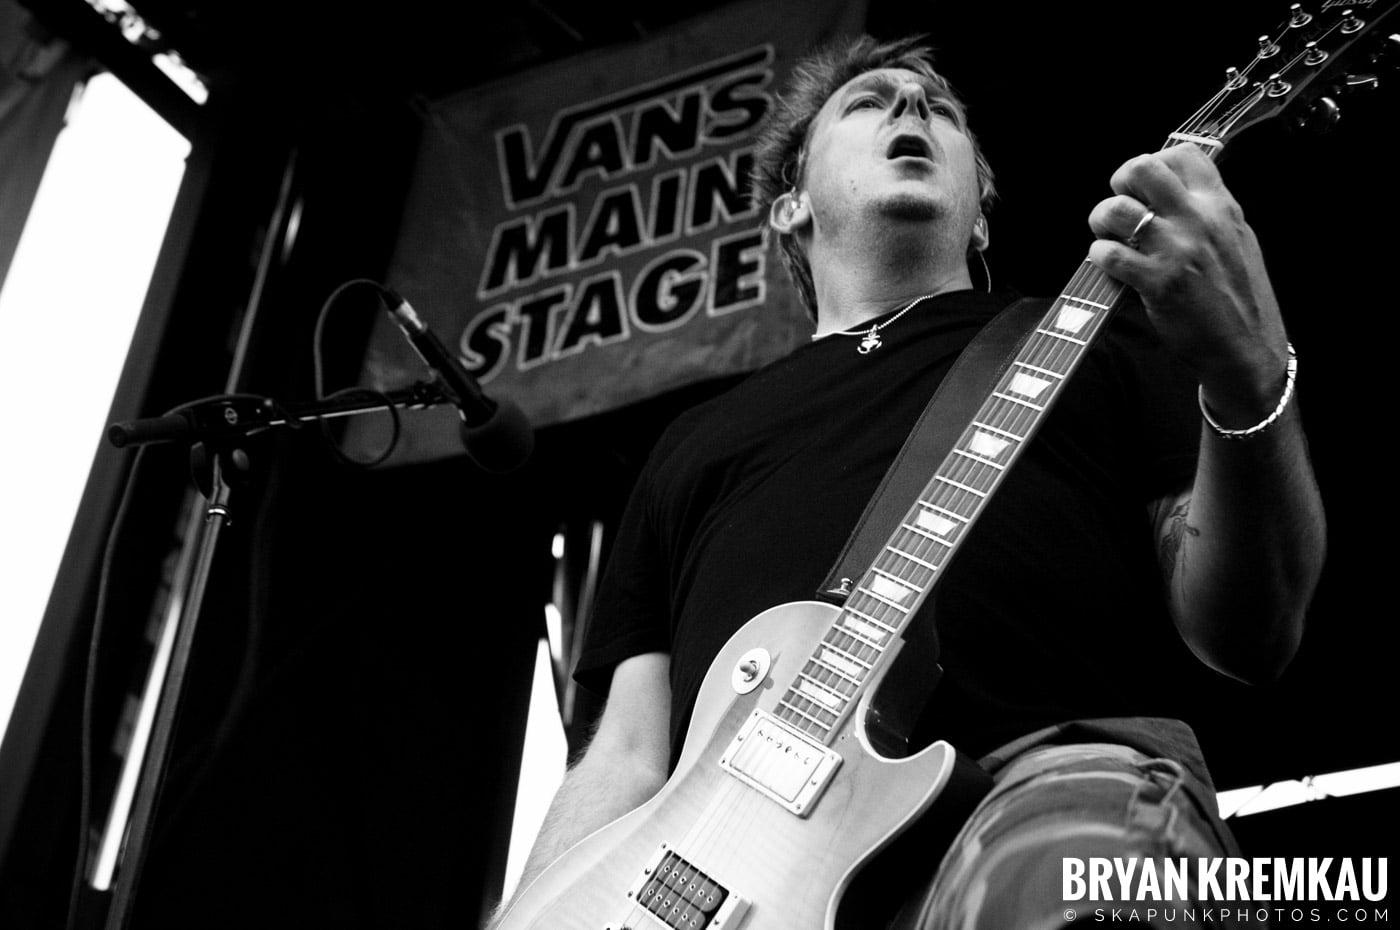 Bad Religion @ Warped Tour 2009, Scranton PA - 07.15.09 (2)